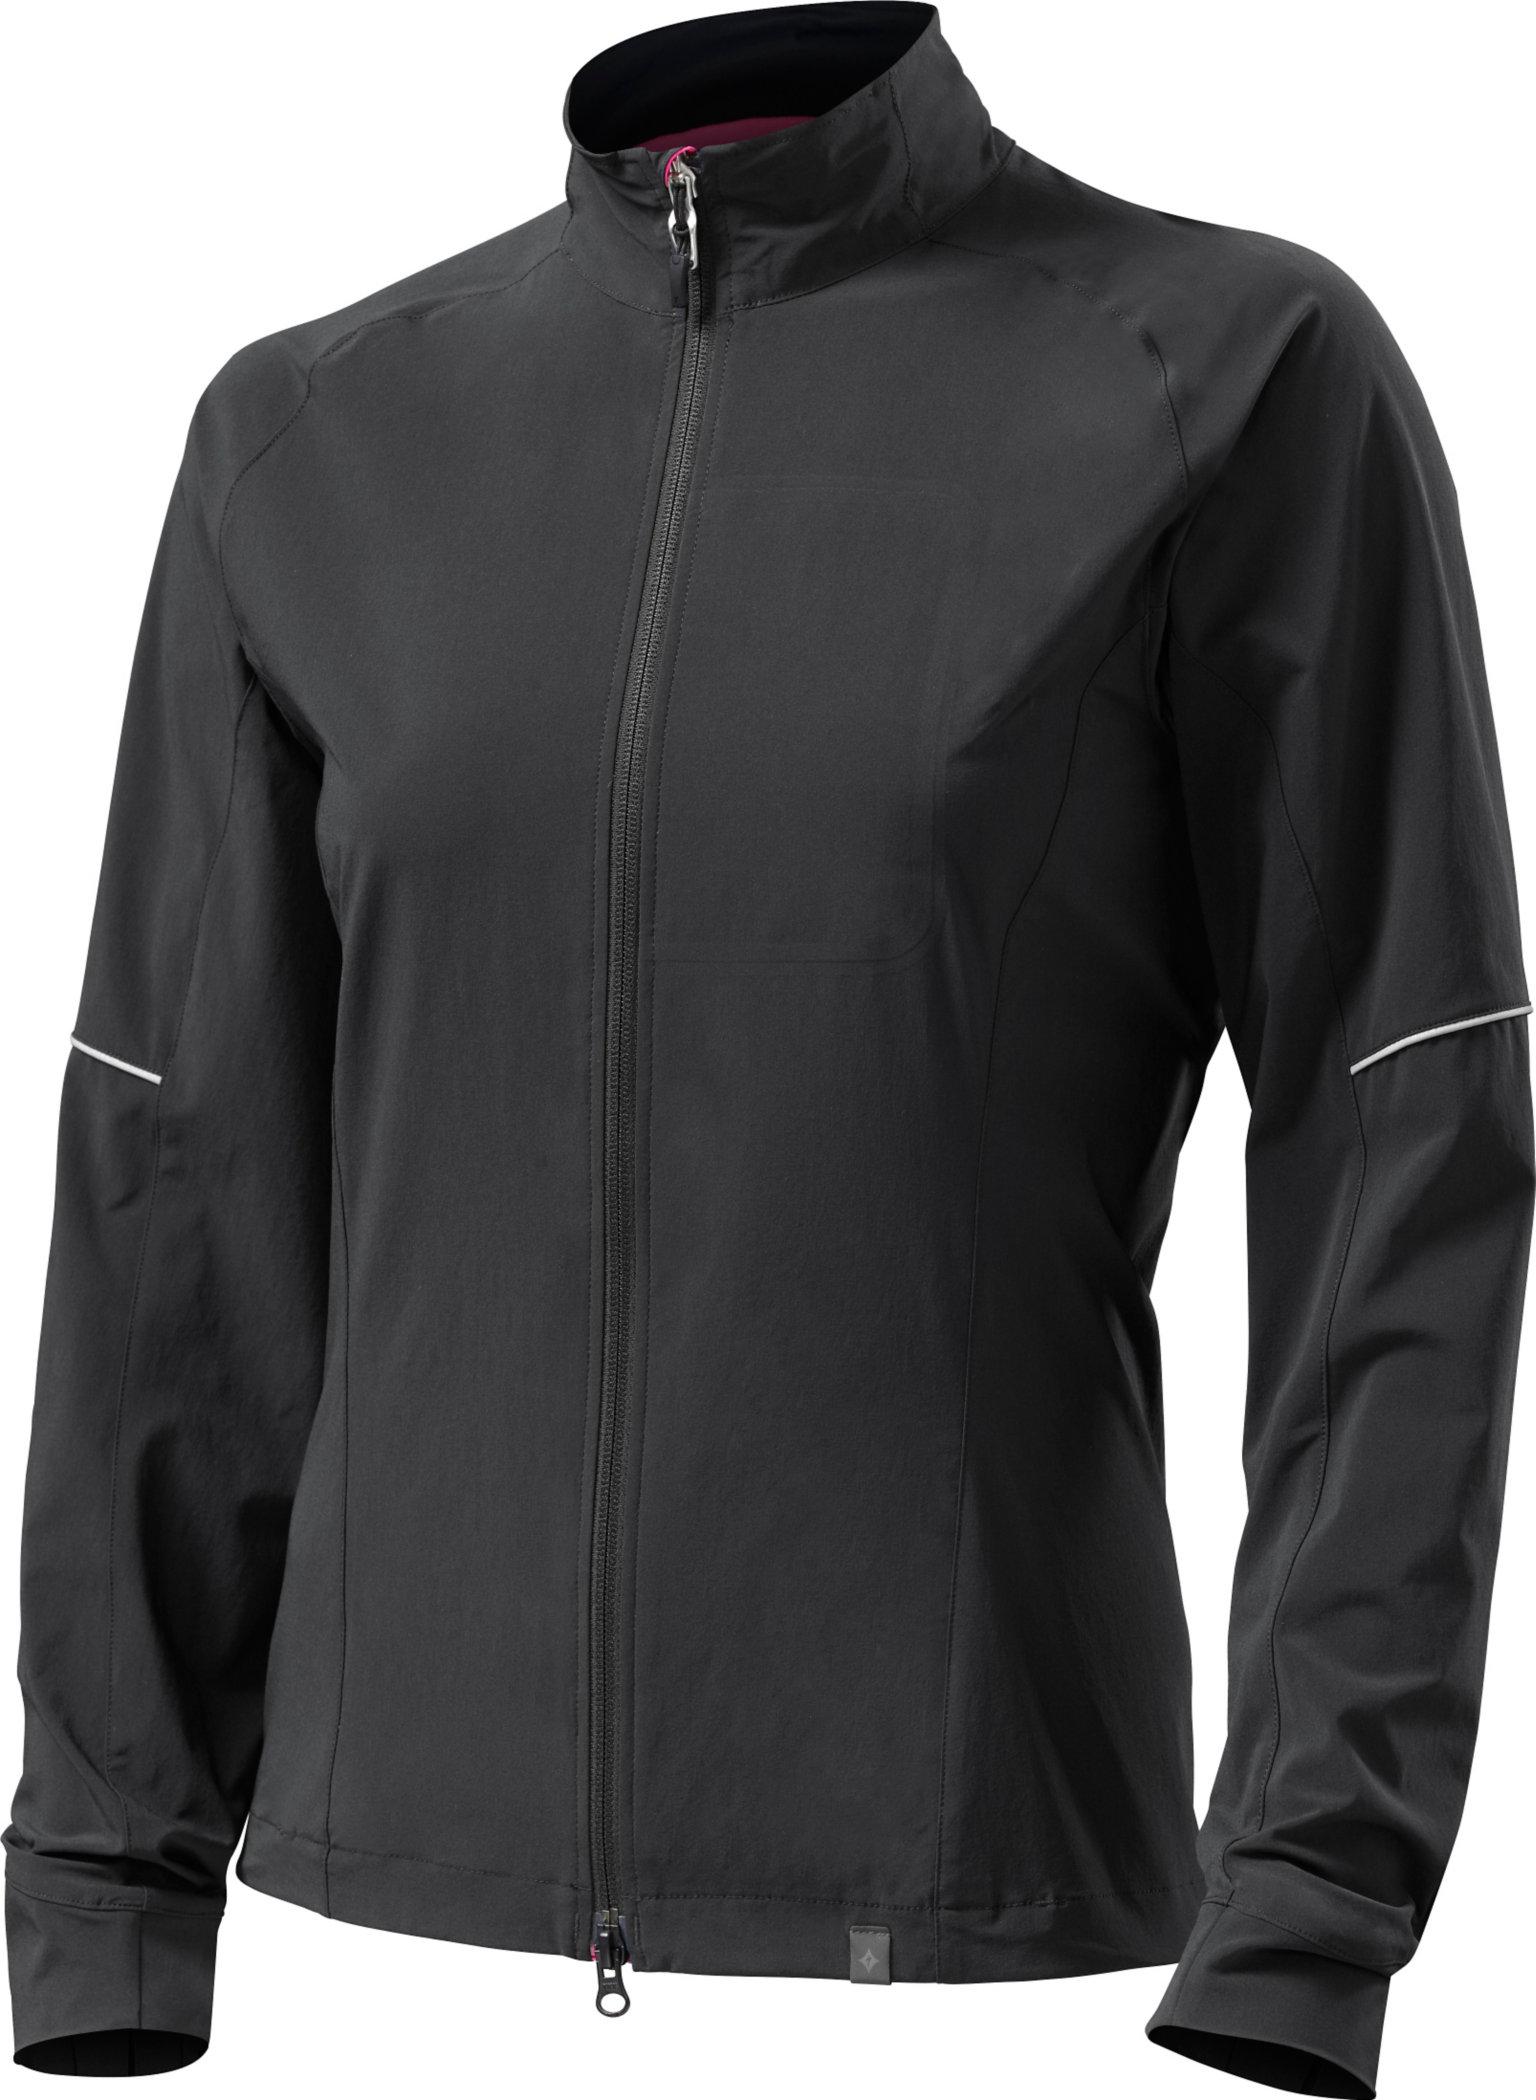 Specialized Women´s Deflect Jacket Black Medium - Alpha Bikes